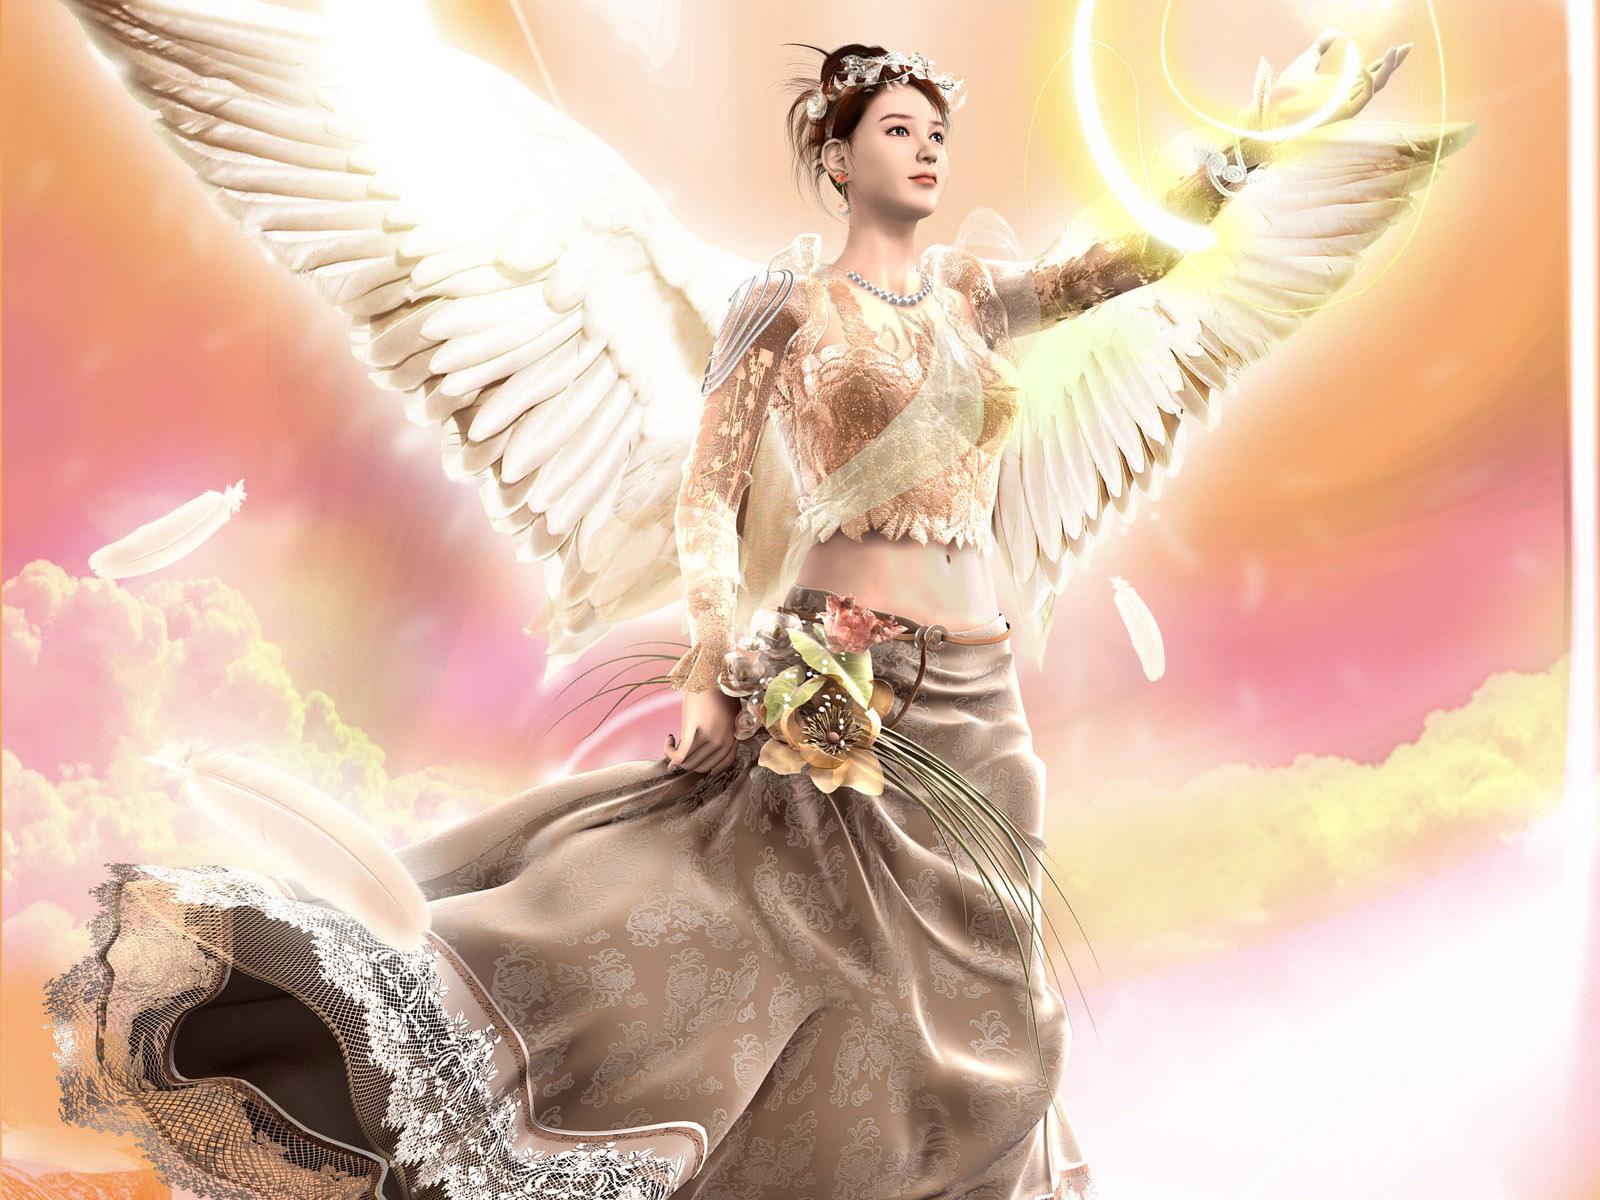 beautiful angels wallpapers pixhome